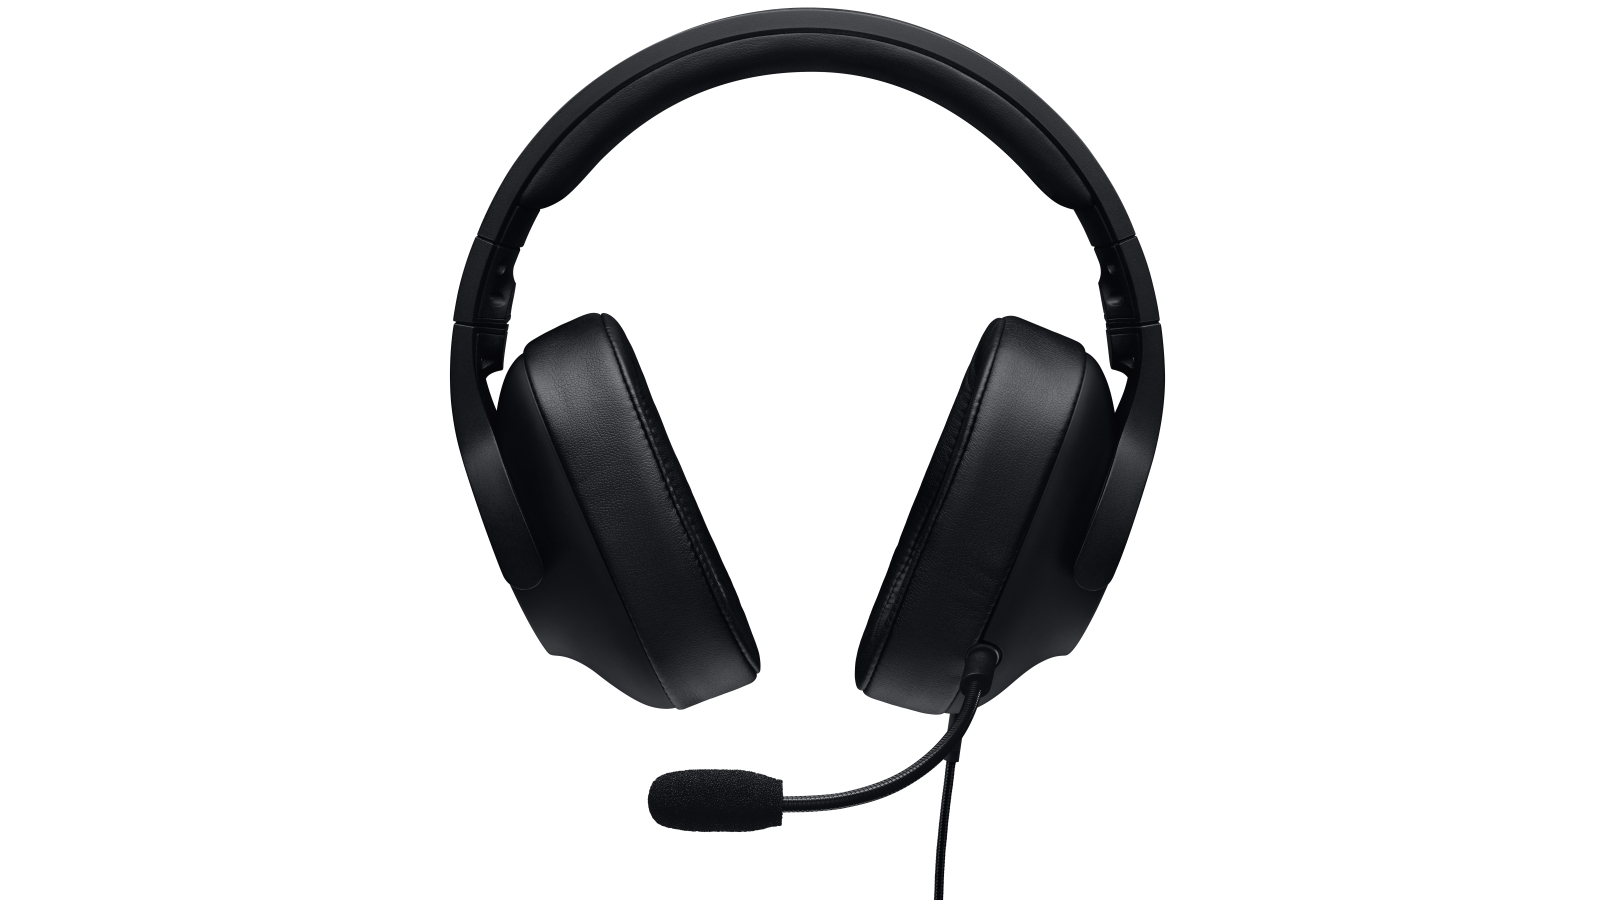 271ad42660b Buy Logitech G Pro Gaming Headset | Harvey Norman AU